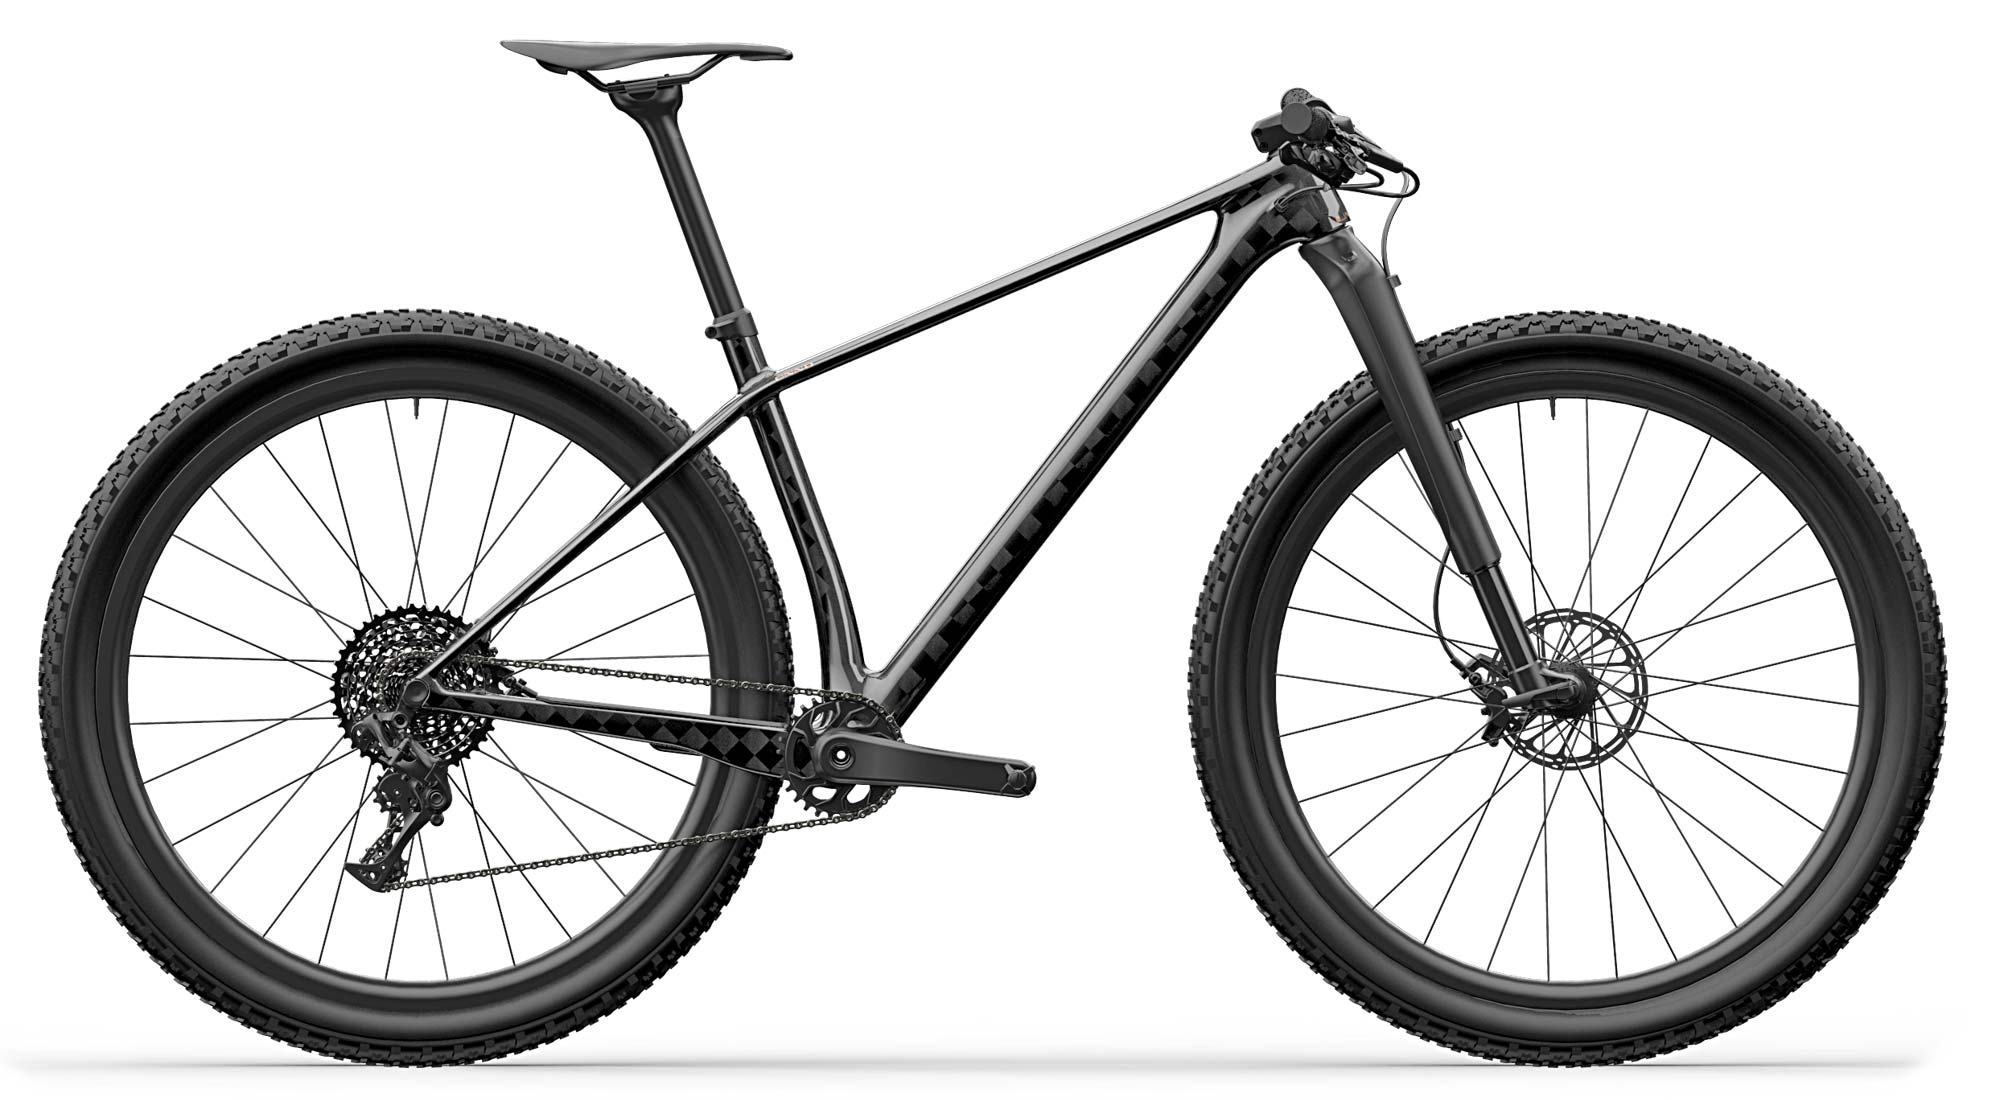 UNNO Aora ultra light carbon XC hardtail mountain bike World's Lightest XC hardtail mountain bike frame